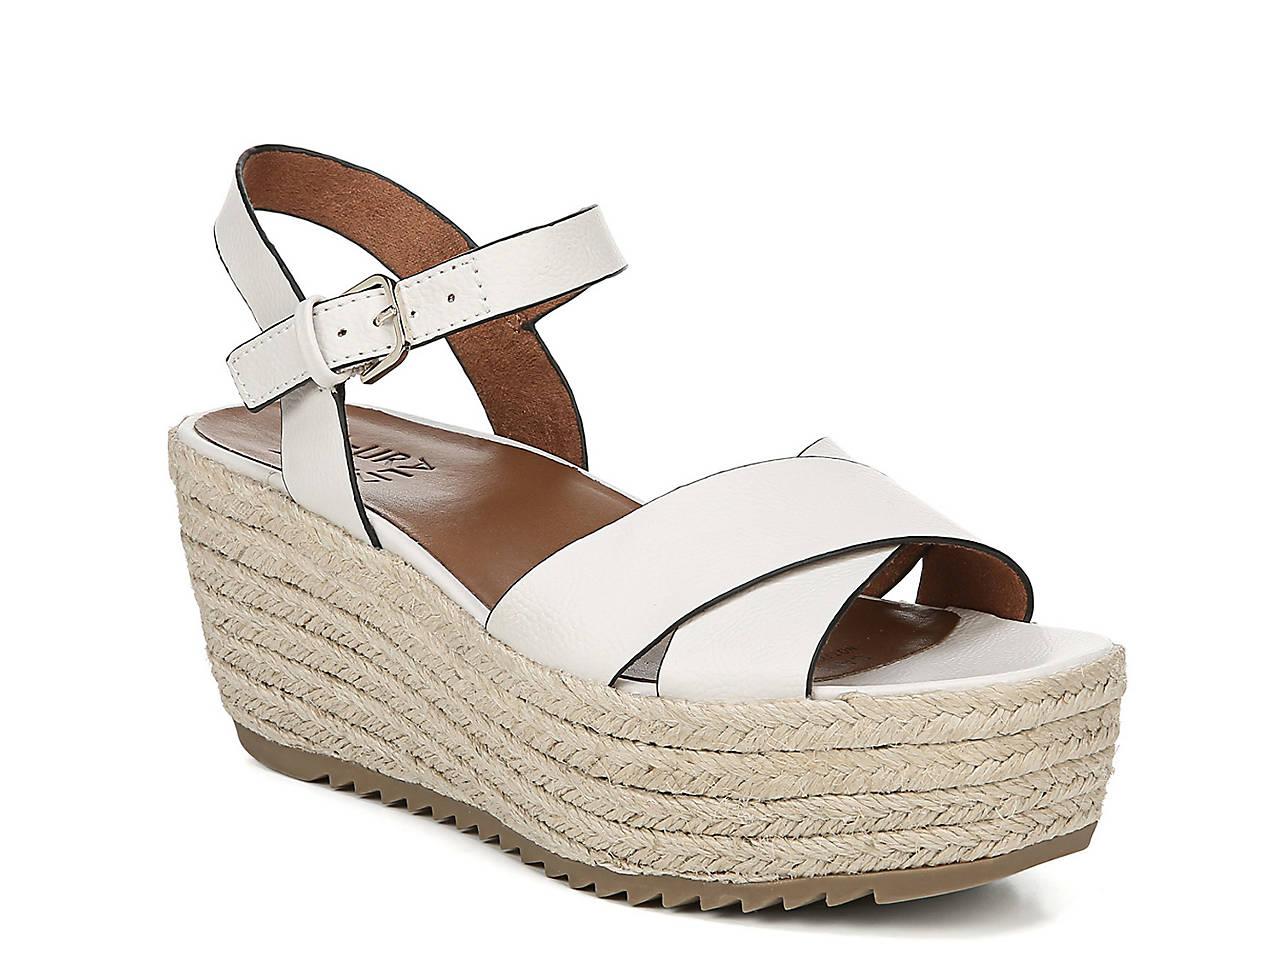 effc77a6b Naturalizer Oceanna Espadrille Wedge Sandal Women's Shoes | DSW